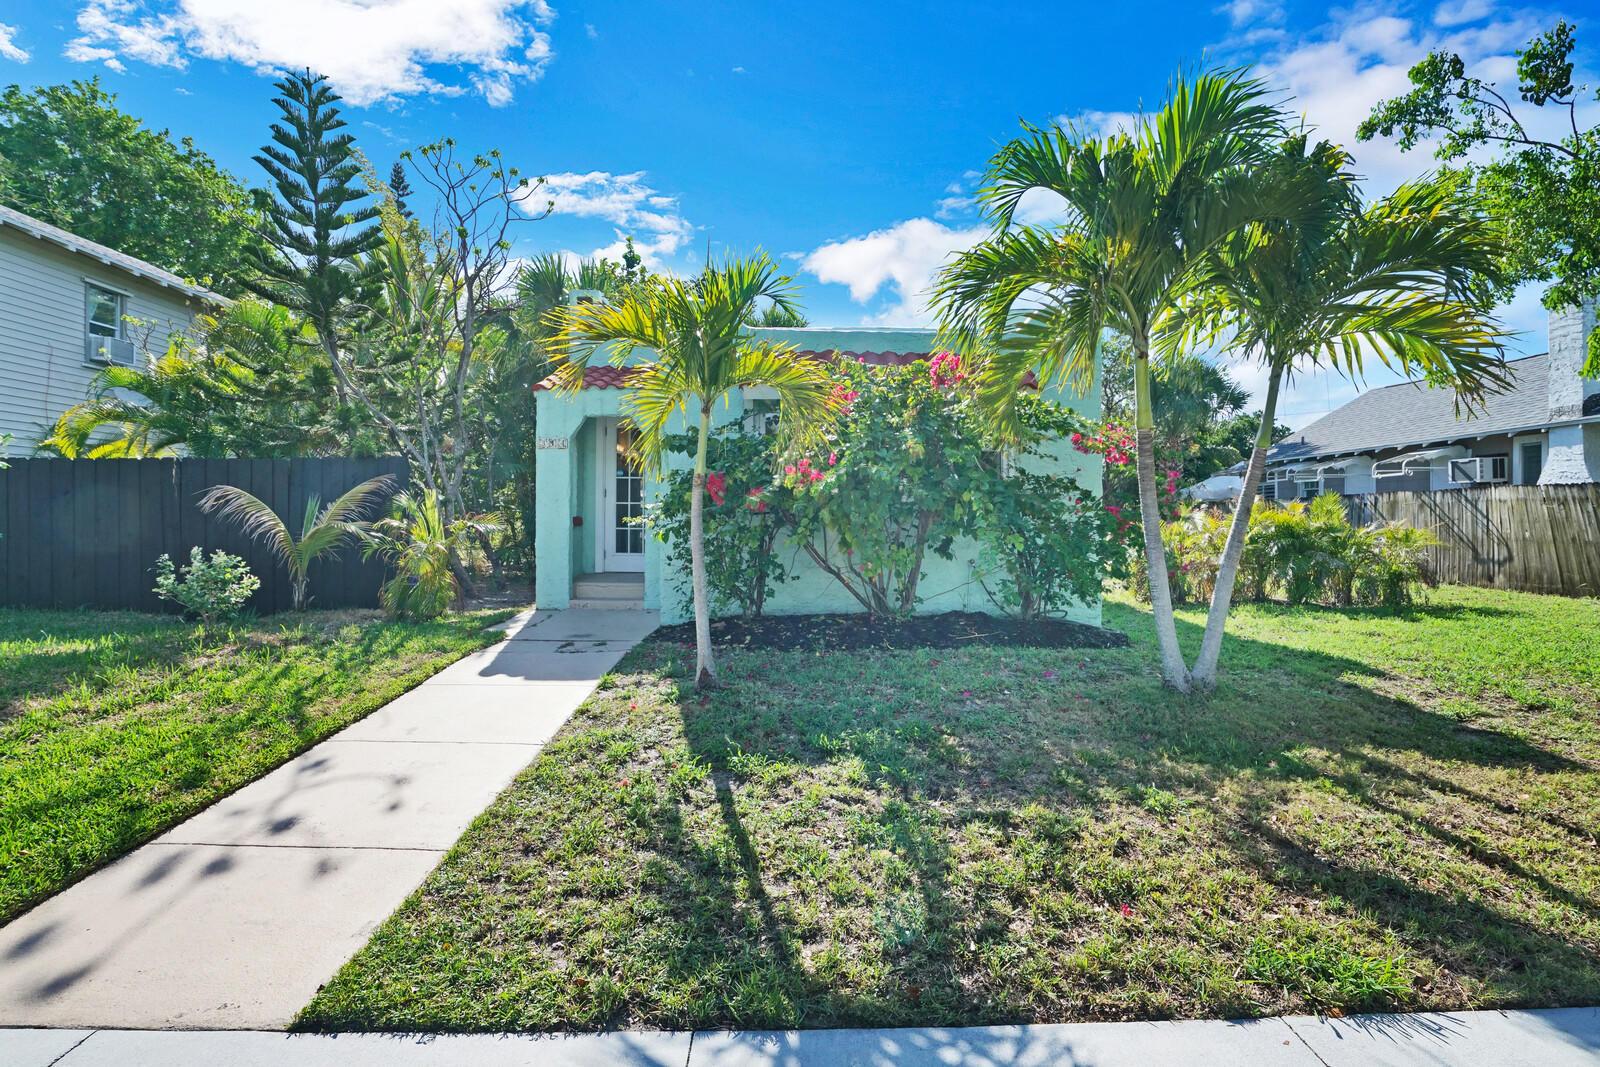 314 L Street, Lake Worth, Florida 33460, 3 Bedrooms Bedrooms, ,2 BathroomsBathrooms,A,Single family,L,RX-10722795